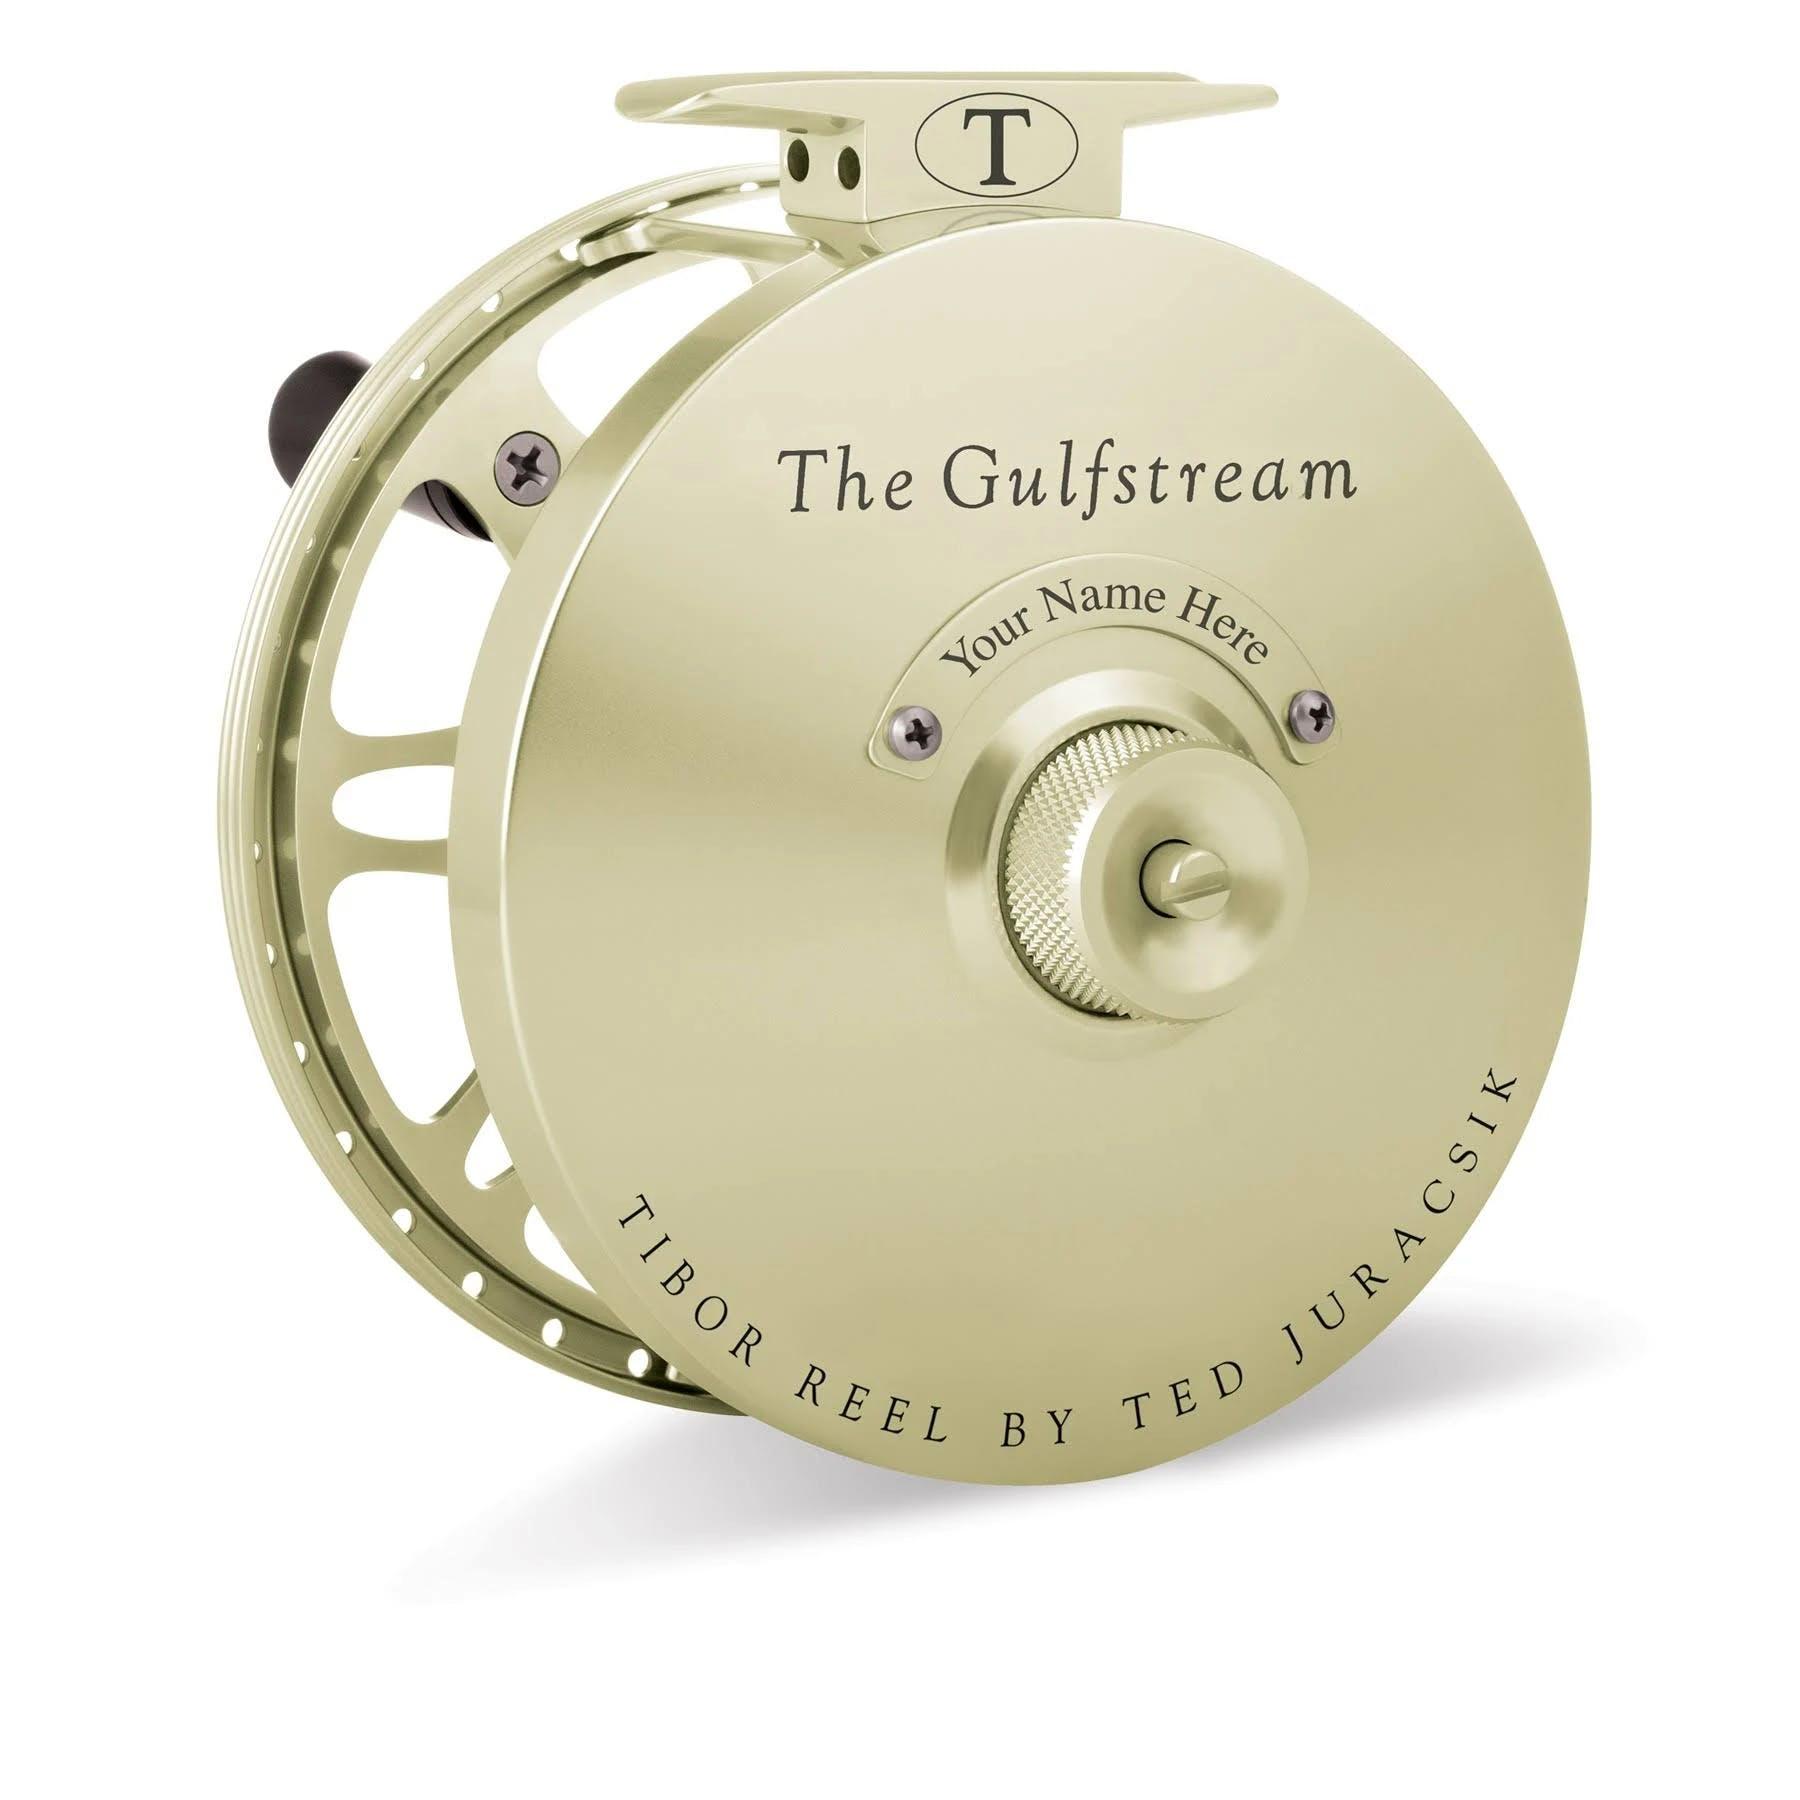 Tibor Gulfstream Gold Spare Spool